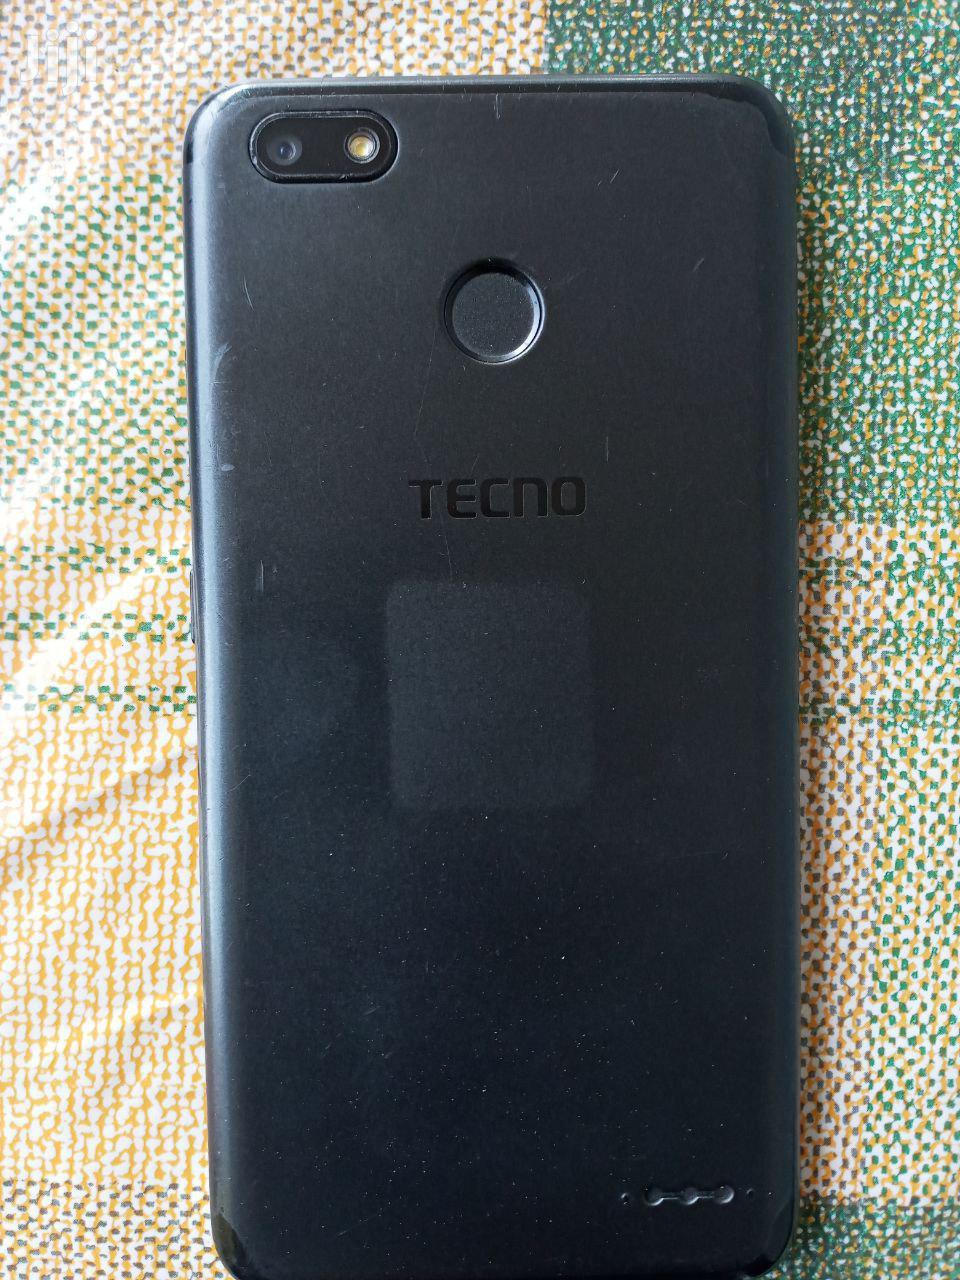 Tecno Spark K7 16 GB Black   Mobile Phones for sale in Kirkos, Addis Ababa, Ethiopia